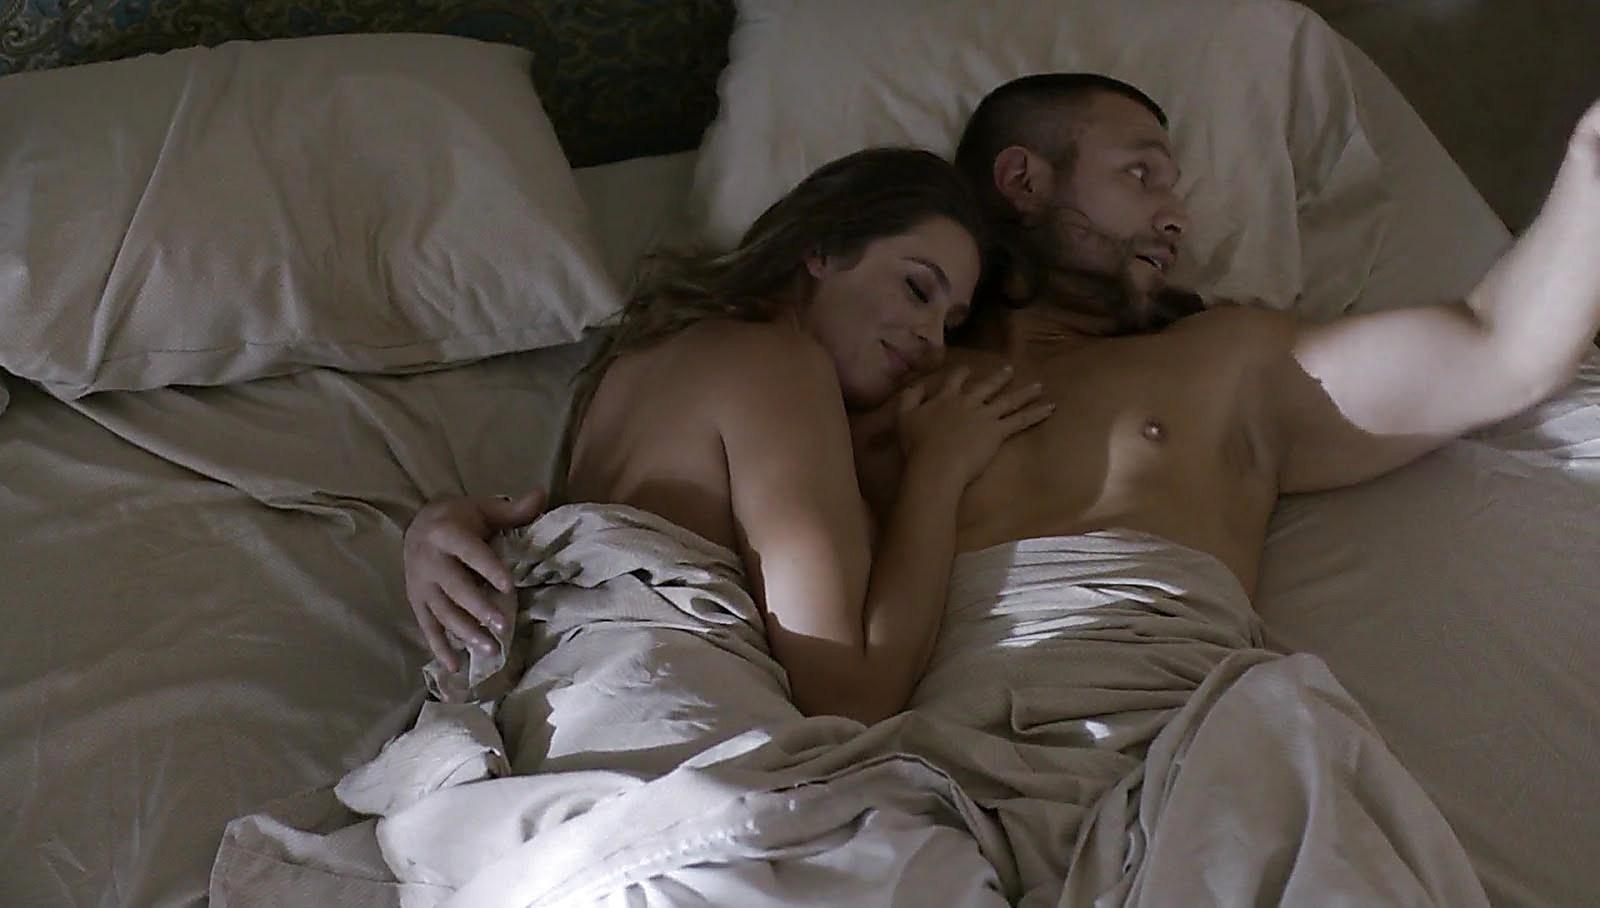 Rafael Amaya sexy shirtless scene May 22, 2018, 11am